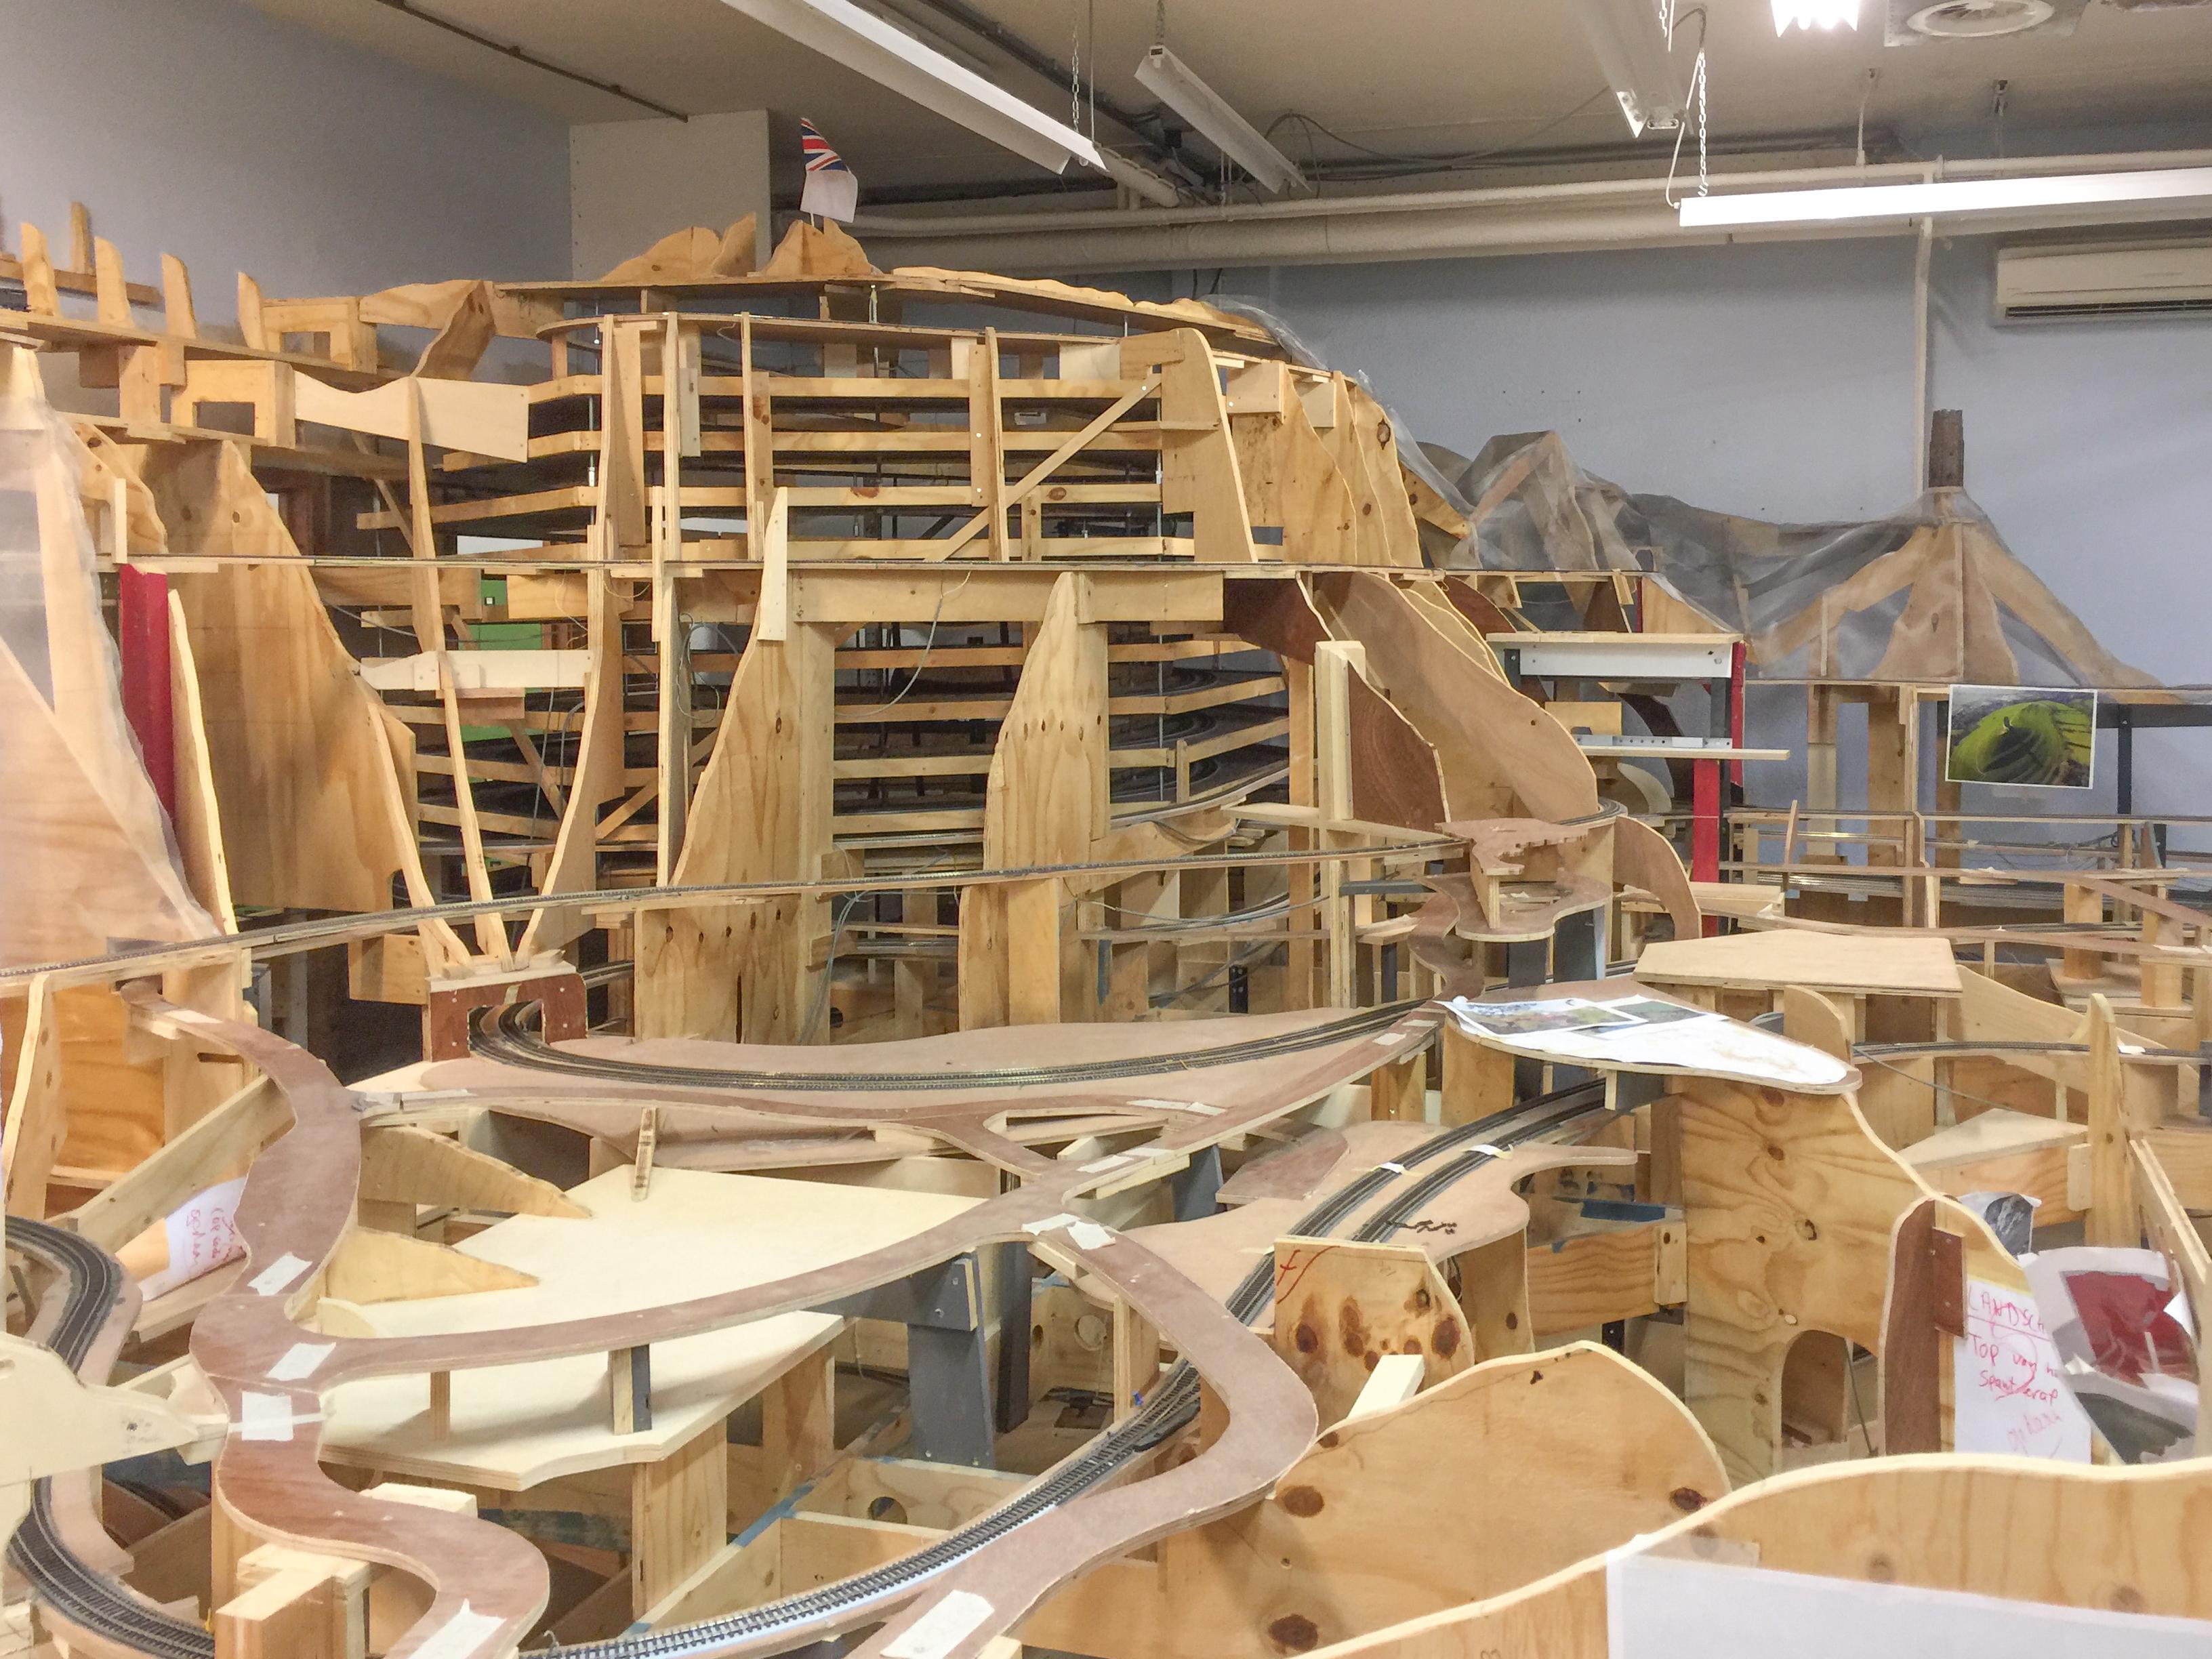 File:Miniworld Rotterdam-11, buildup of new section, with theme England-Scotland (Aug 2016).jpg ...